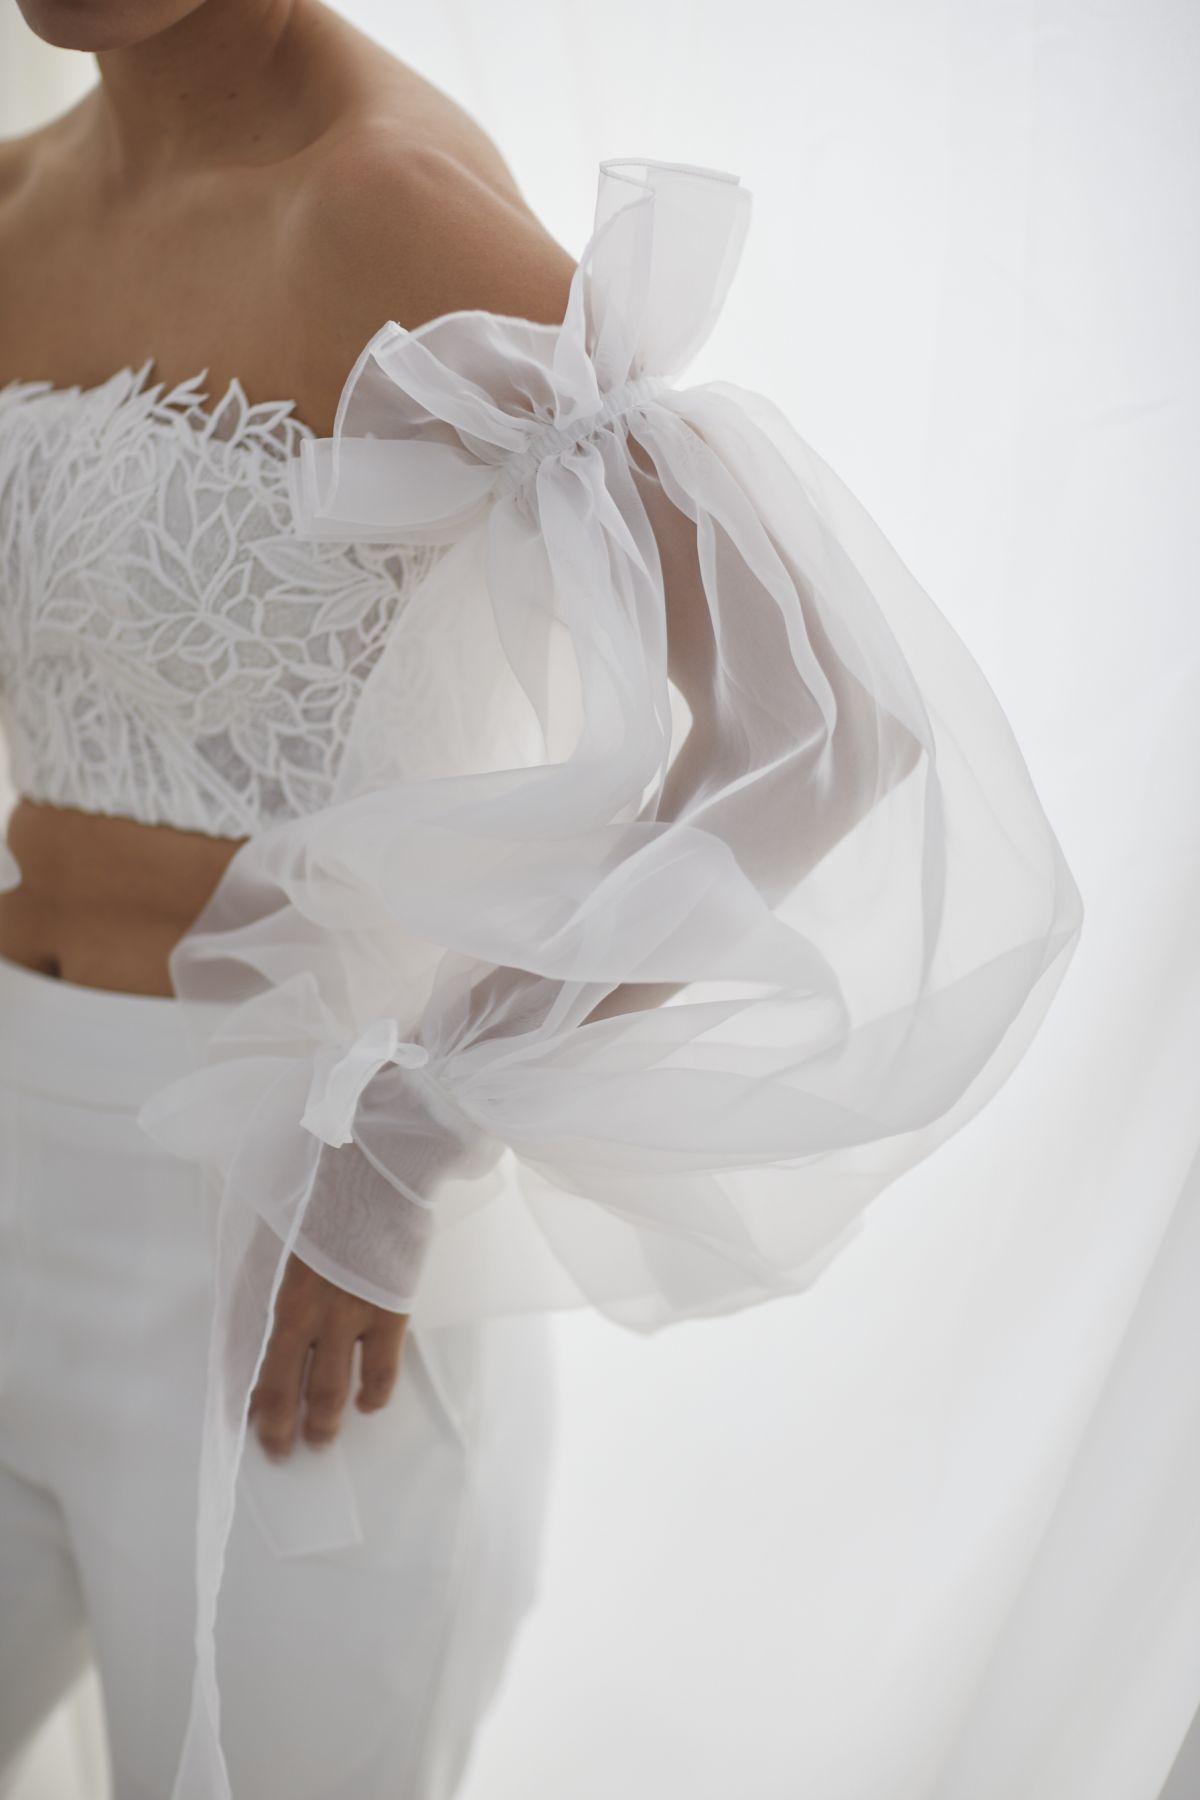 Autunno Sleeves Organza Wedding Gown 52_3638